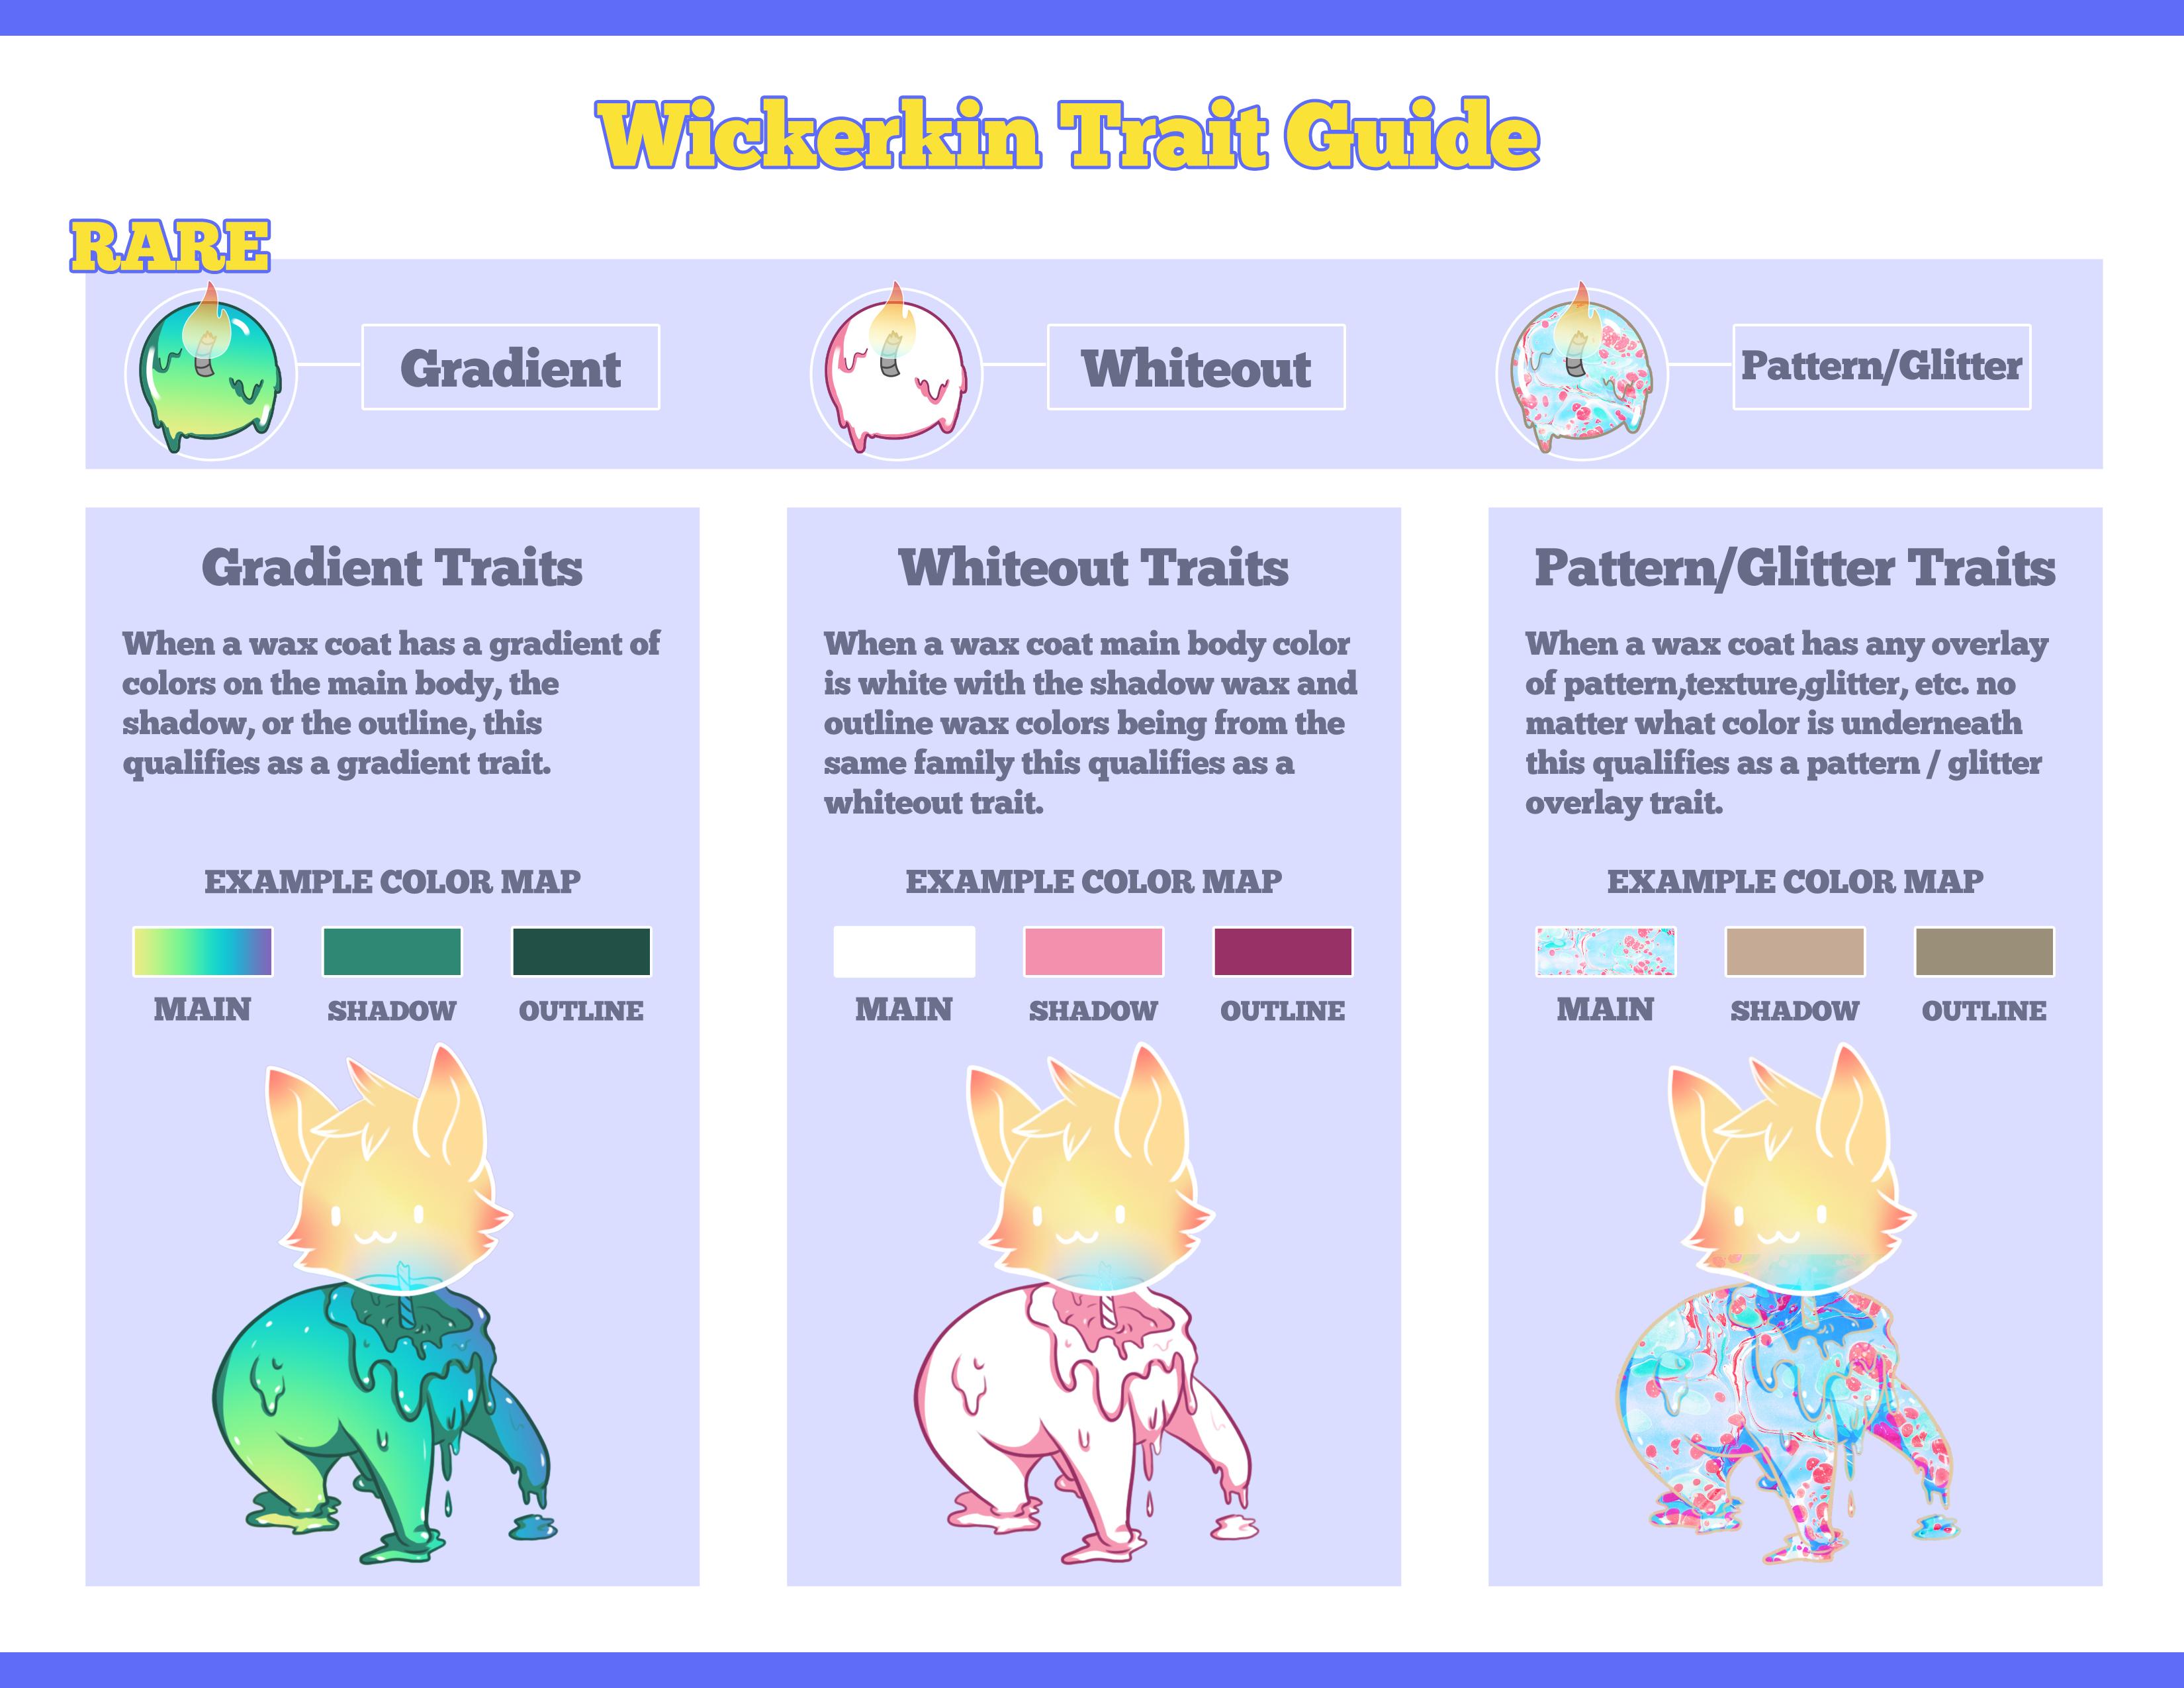 Wickerkin_Trait_Guide_Rare_Traits.jpg